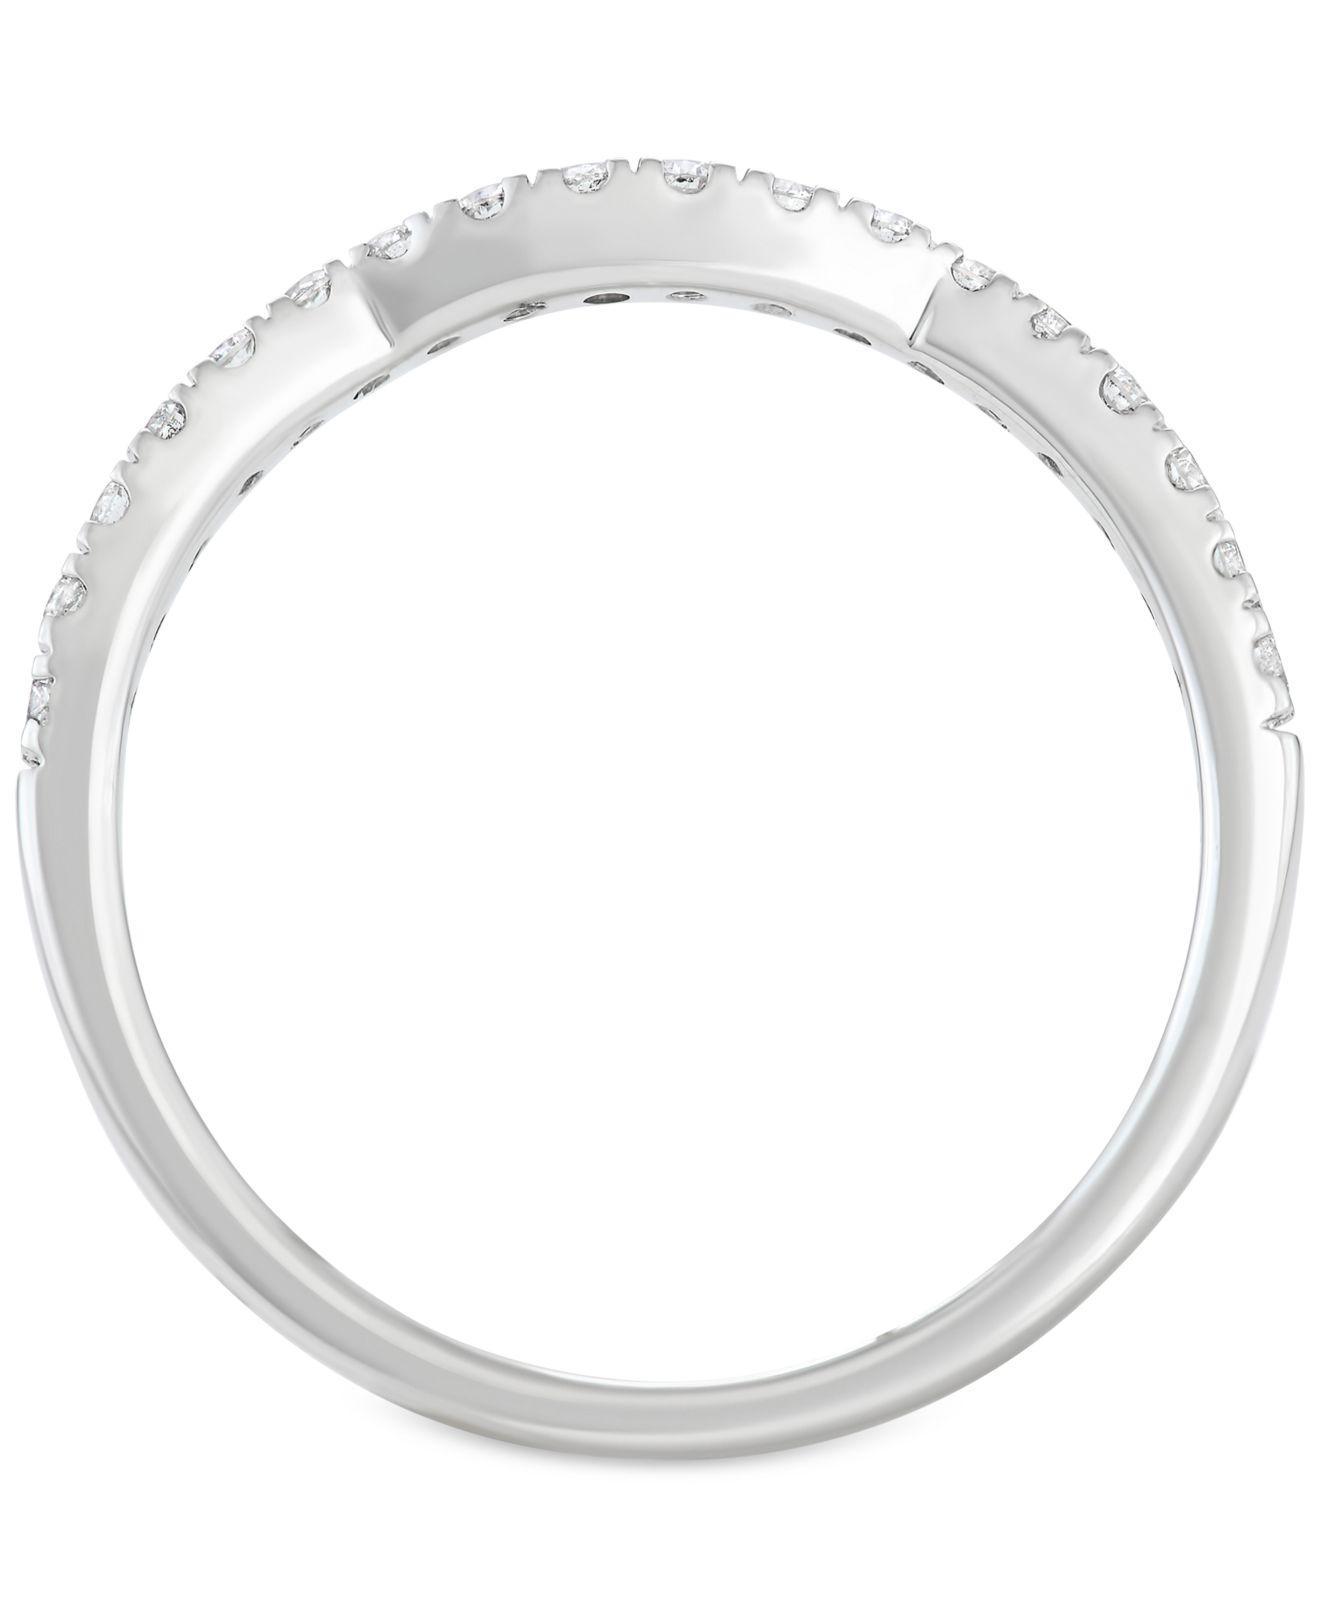 Macy s Diamond 3 pc Halo Quad Bridal Set 2 Ct T w In 14k